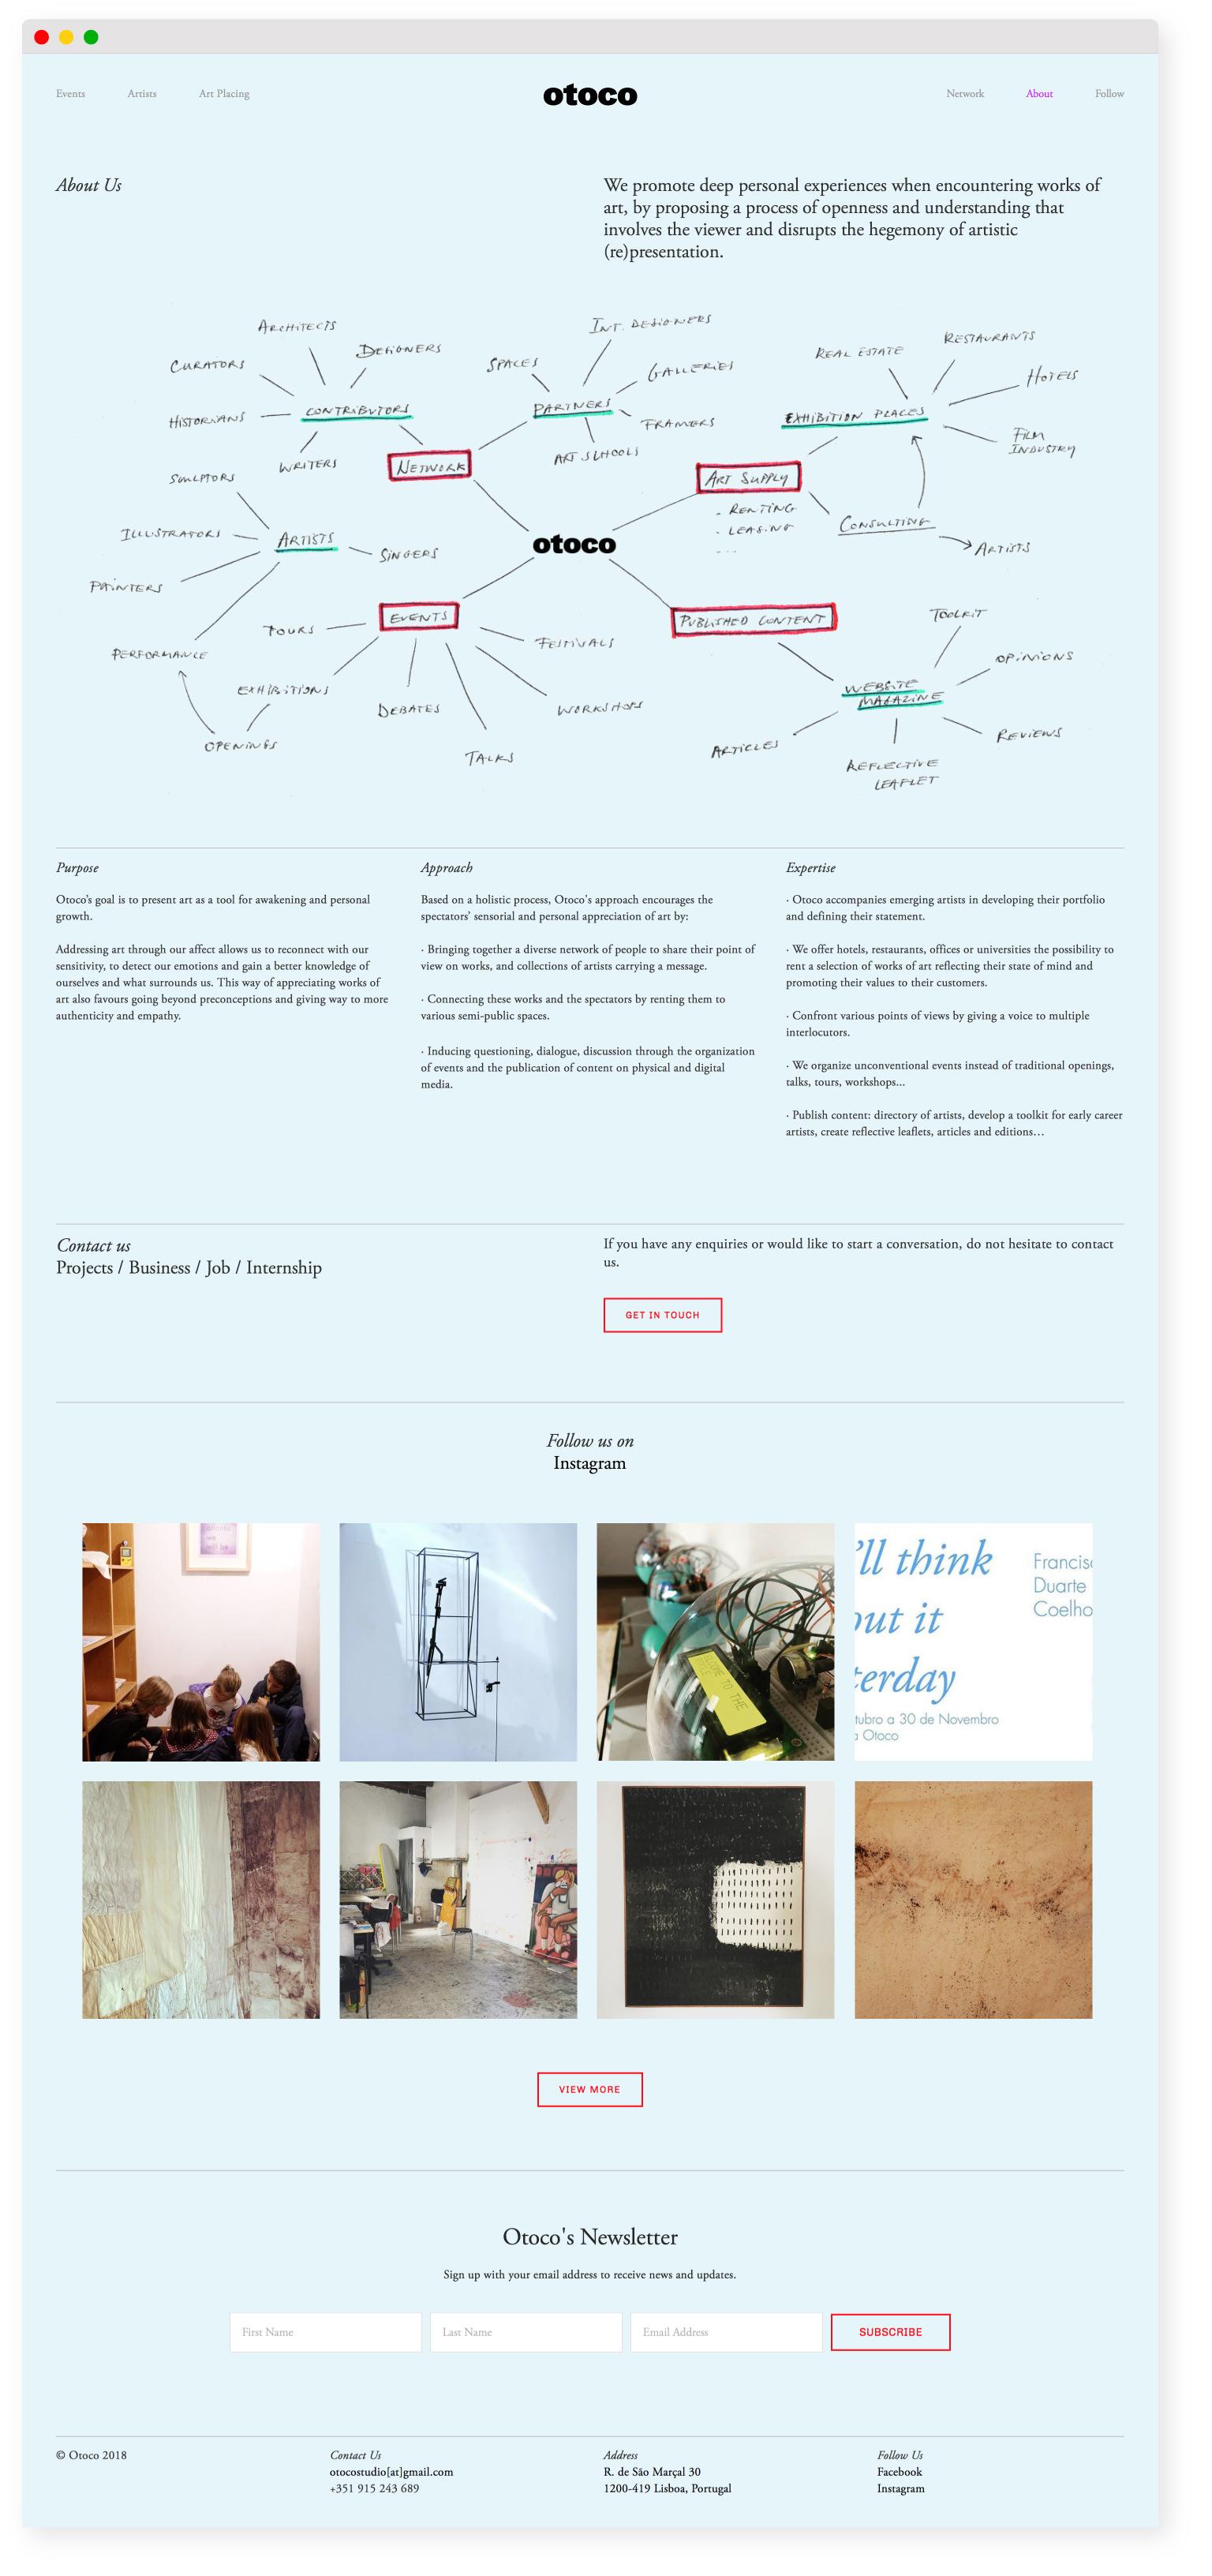 vlevle-Otoco-website-2.jpg